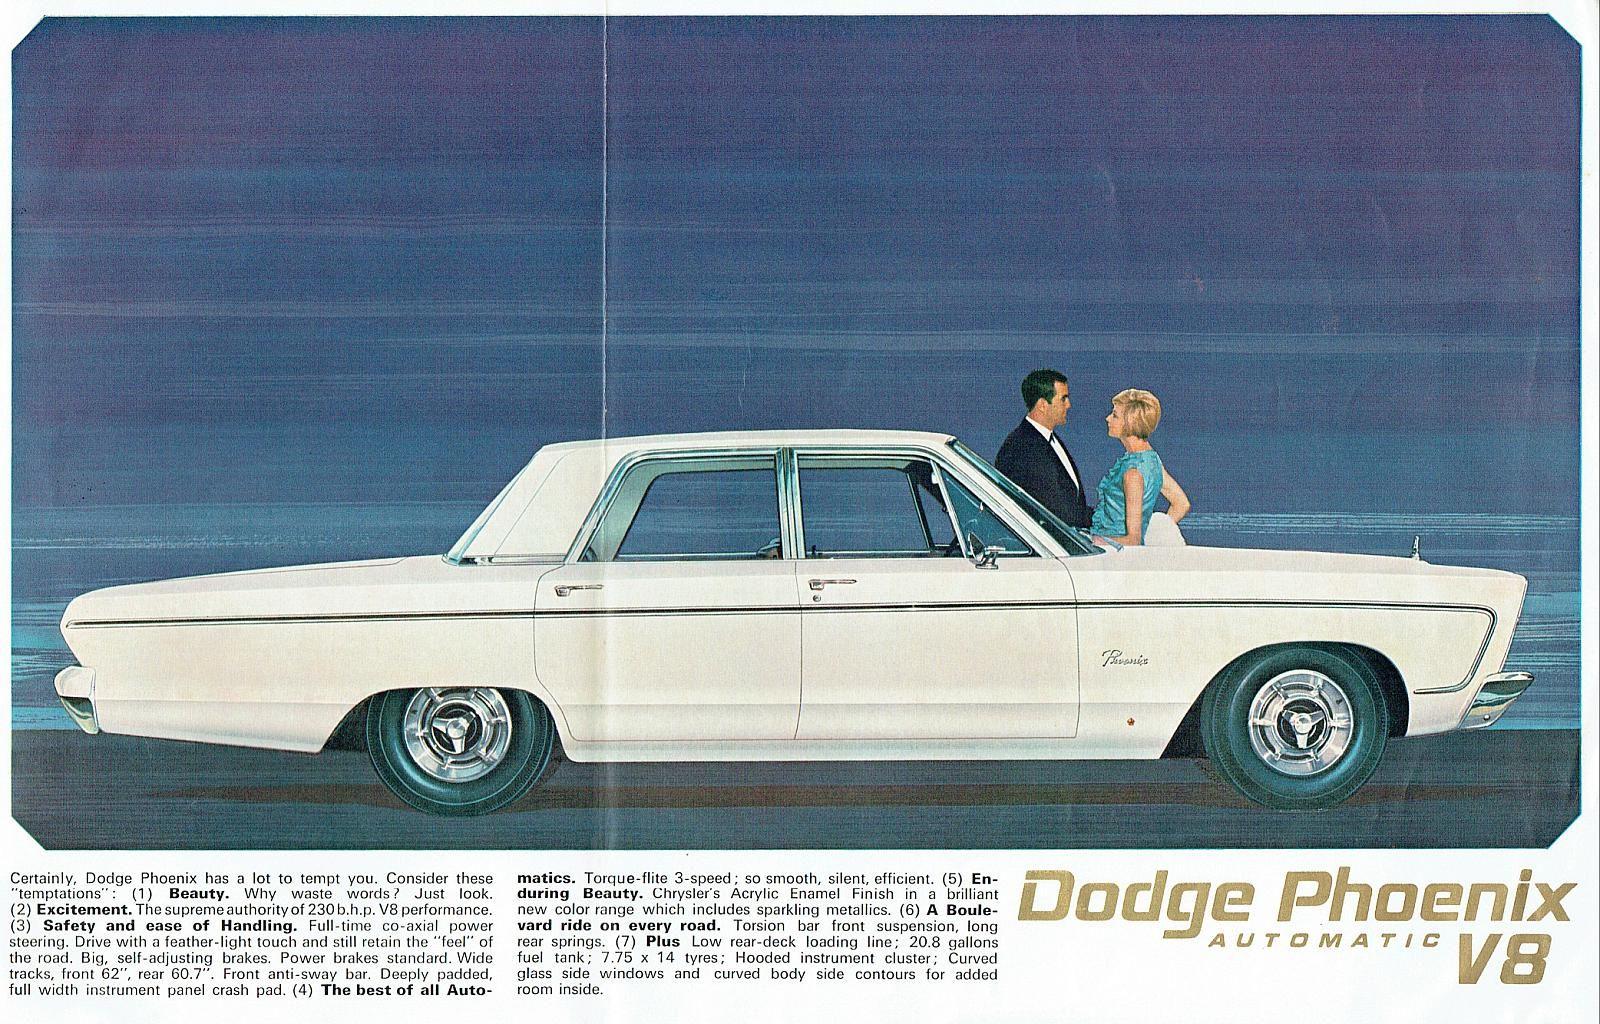 1966 Dodge Phoenix (Aus) | Classic Marques - Chrysler Australia ...